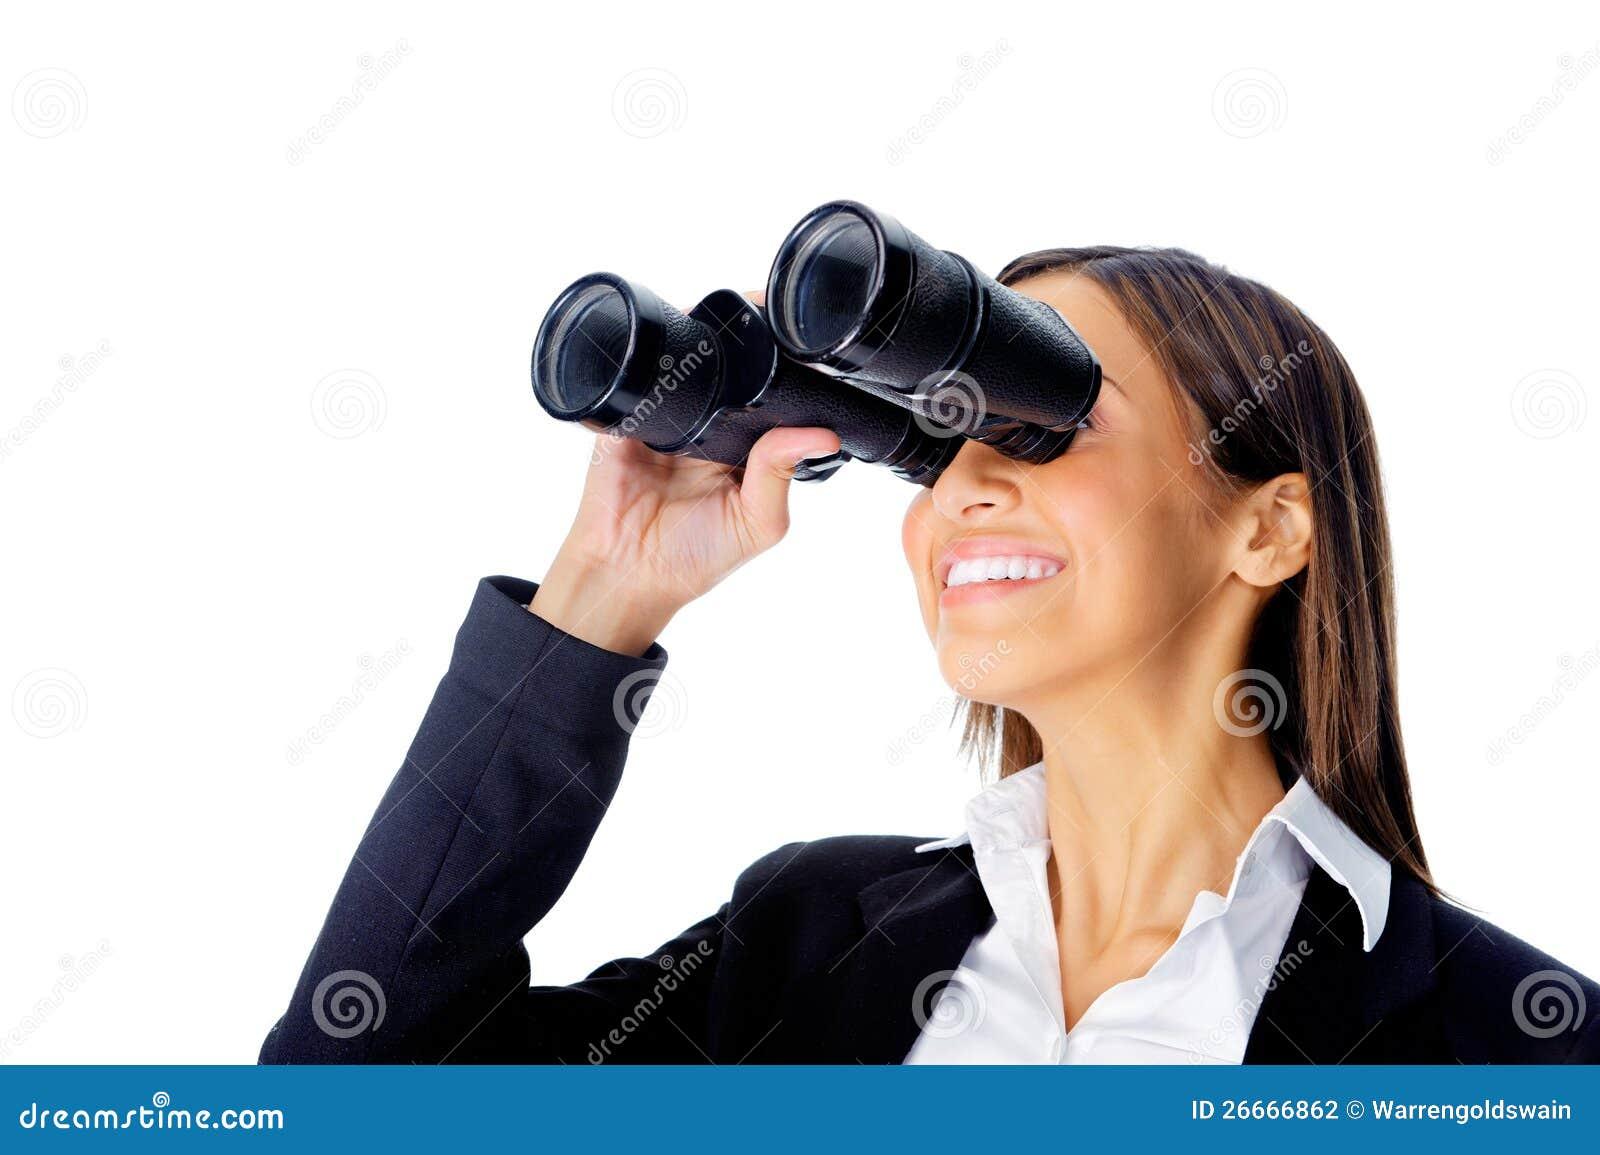 Binocular Business Woman Stock Photo. Image Of Happy